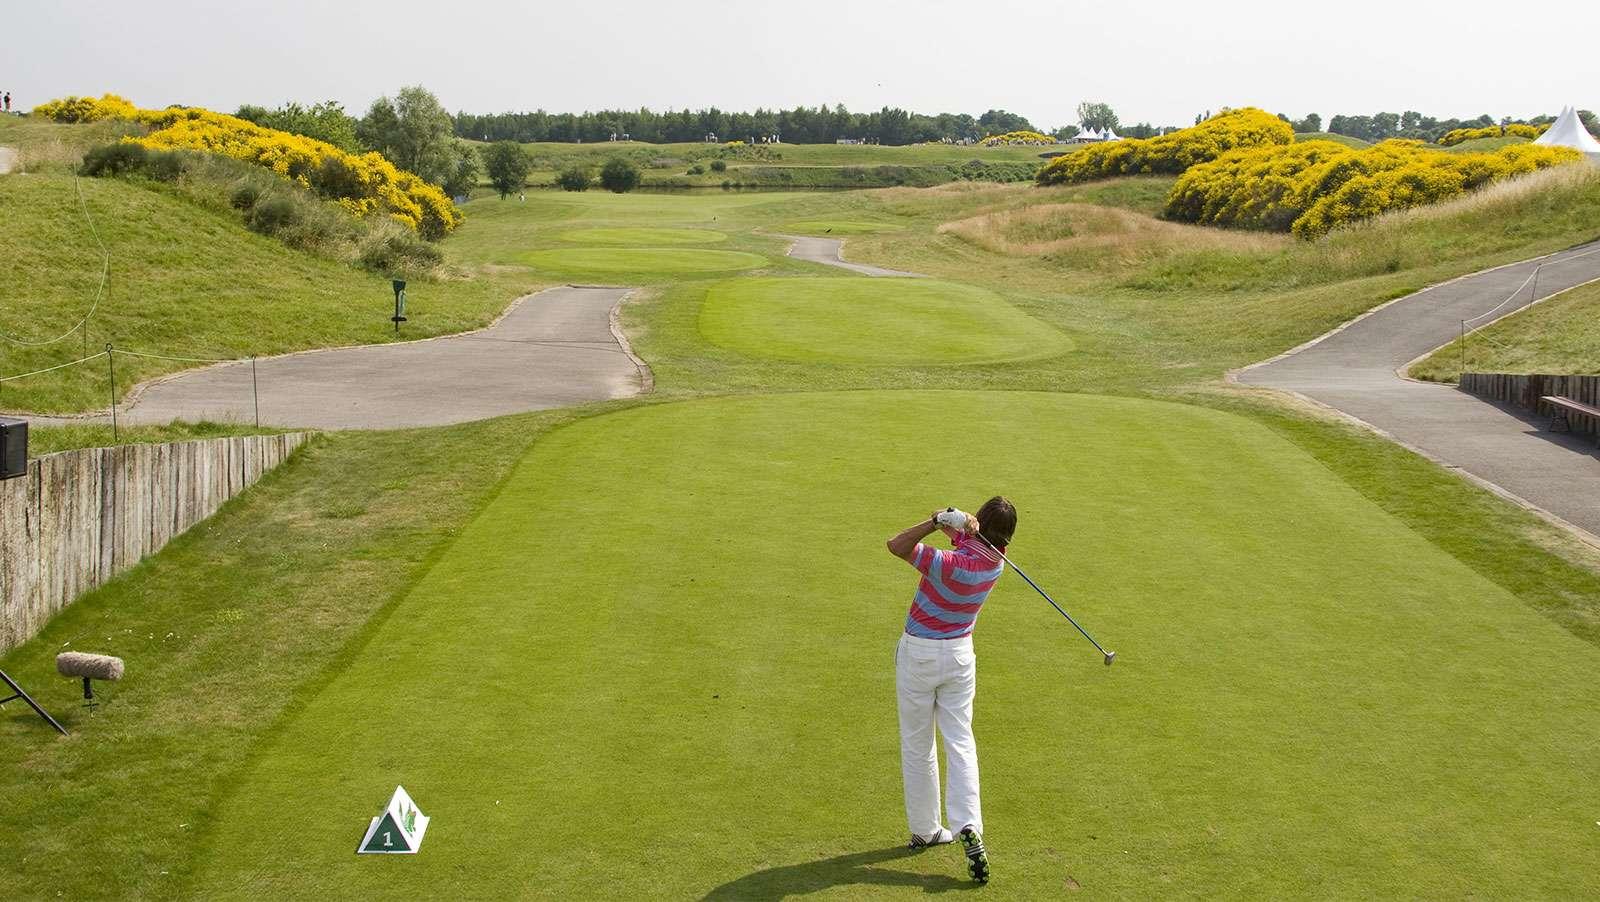 US Open / British Open / PGA Championship Futures Roundup